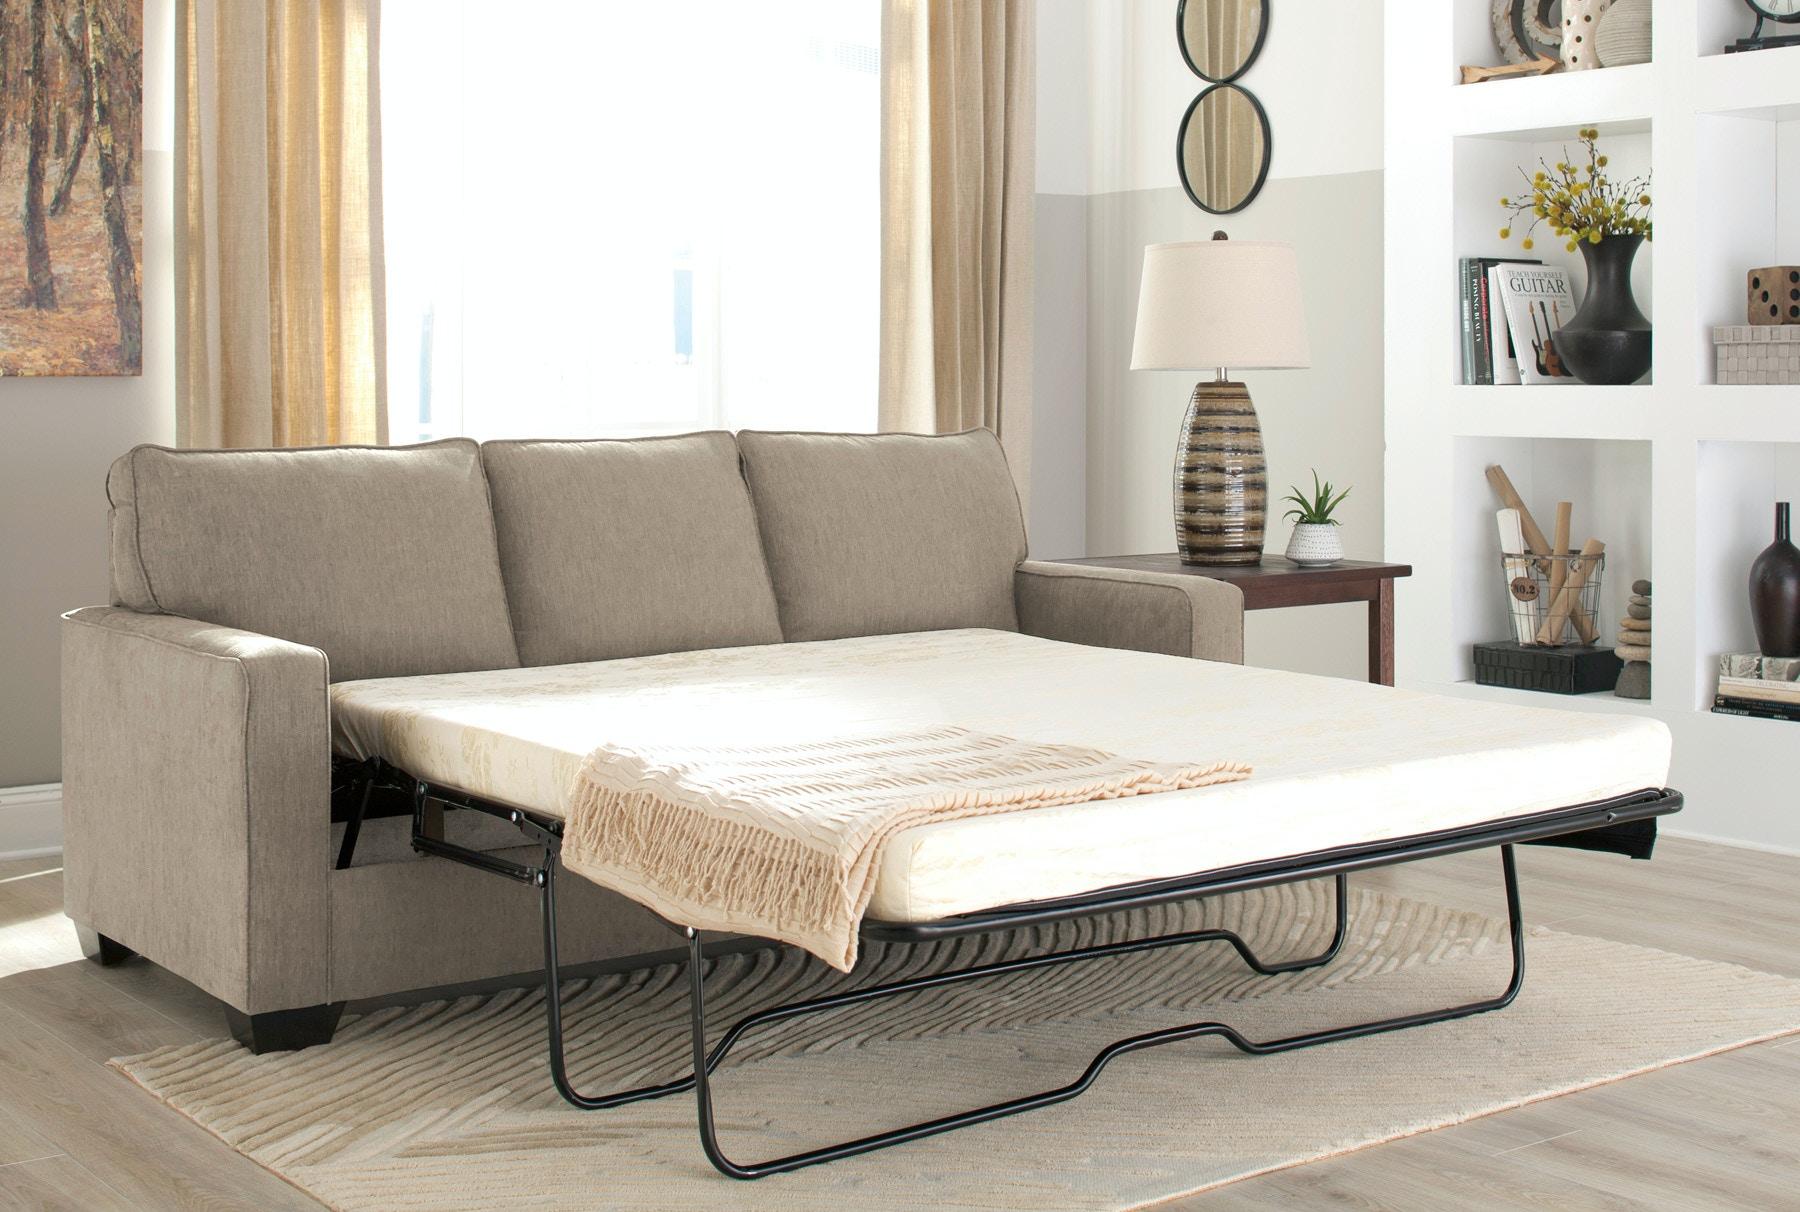 Nantucket 2 seat slipcover queen sleeper sofa rowe furniture rowe - Signature Design By Ashley Living Room Zeb Queen Sleeper Sofa